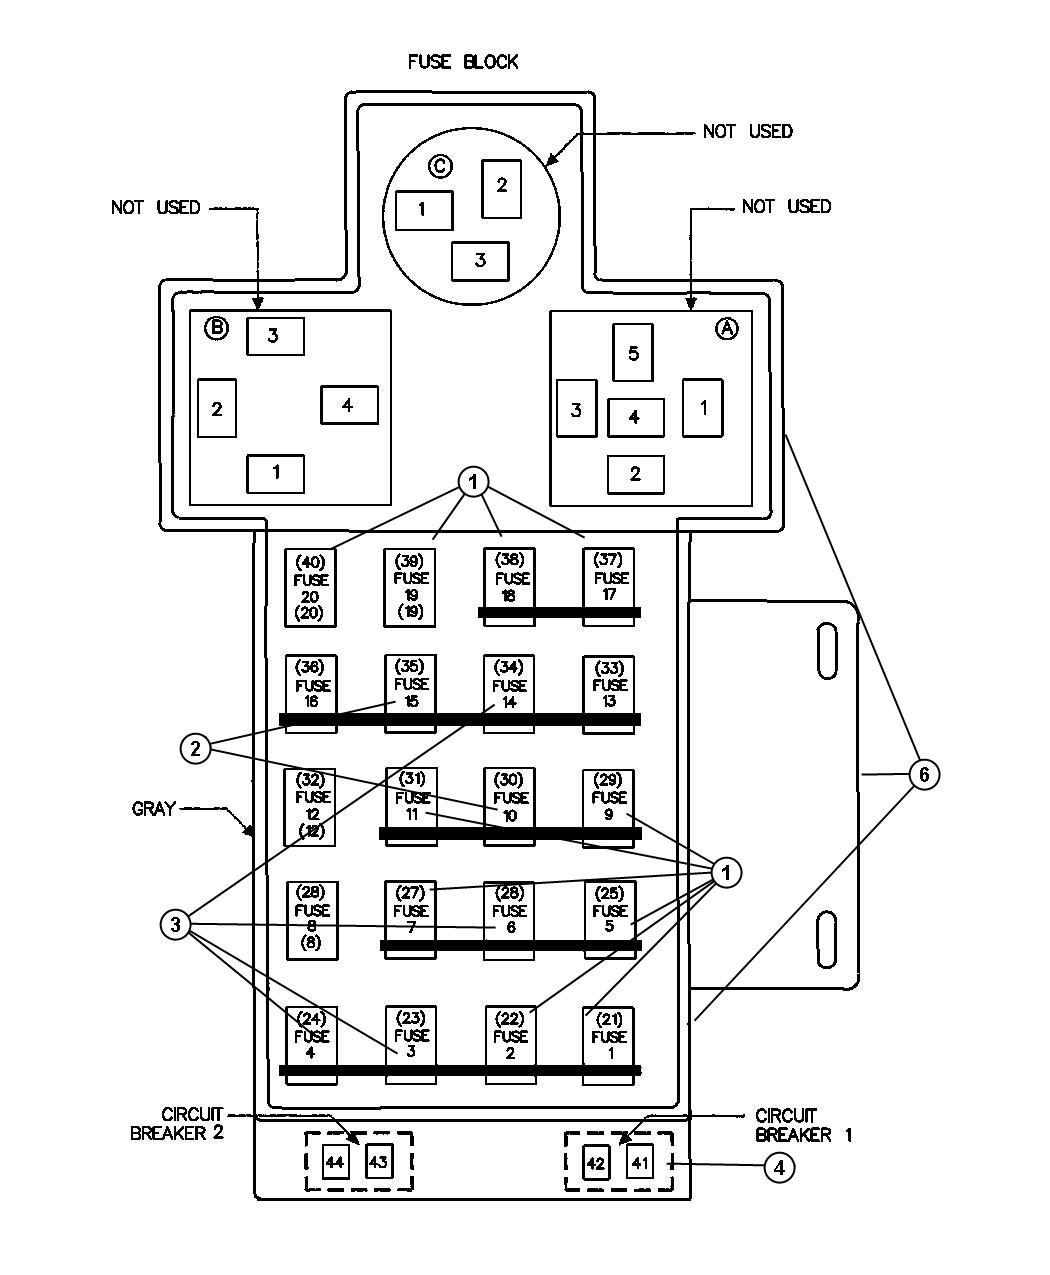 Jeep Wrangler Breaker  Circuit  20 Amp  20 Amp Fuse Base  Power Seat  Power Window